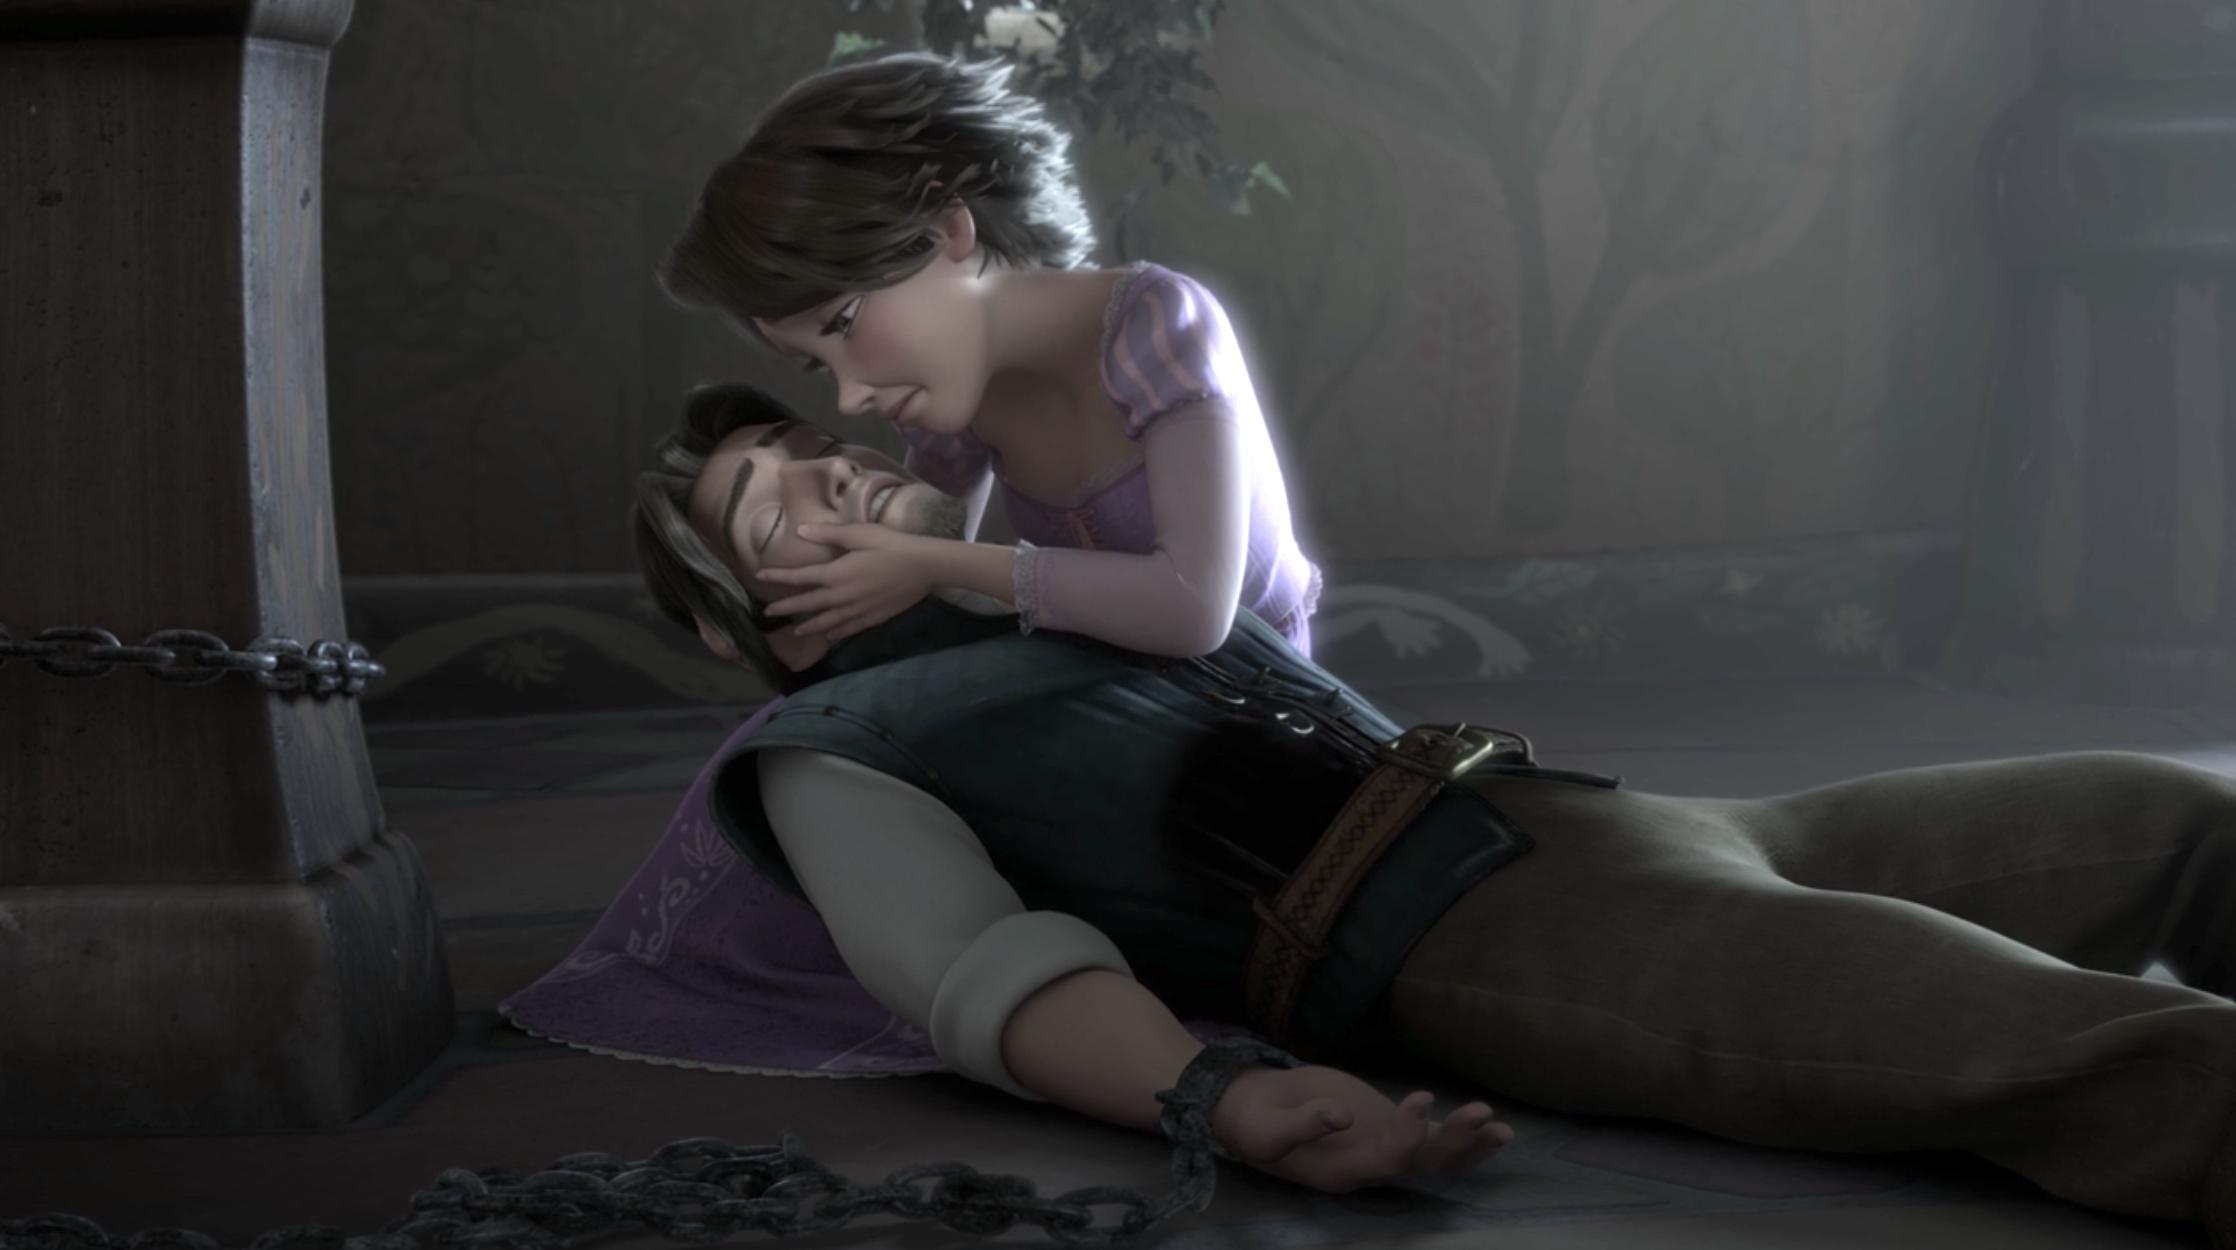 Flynn almost dies in Rapunzel's arms in Tangled